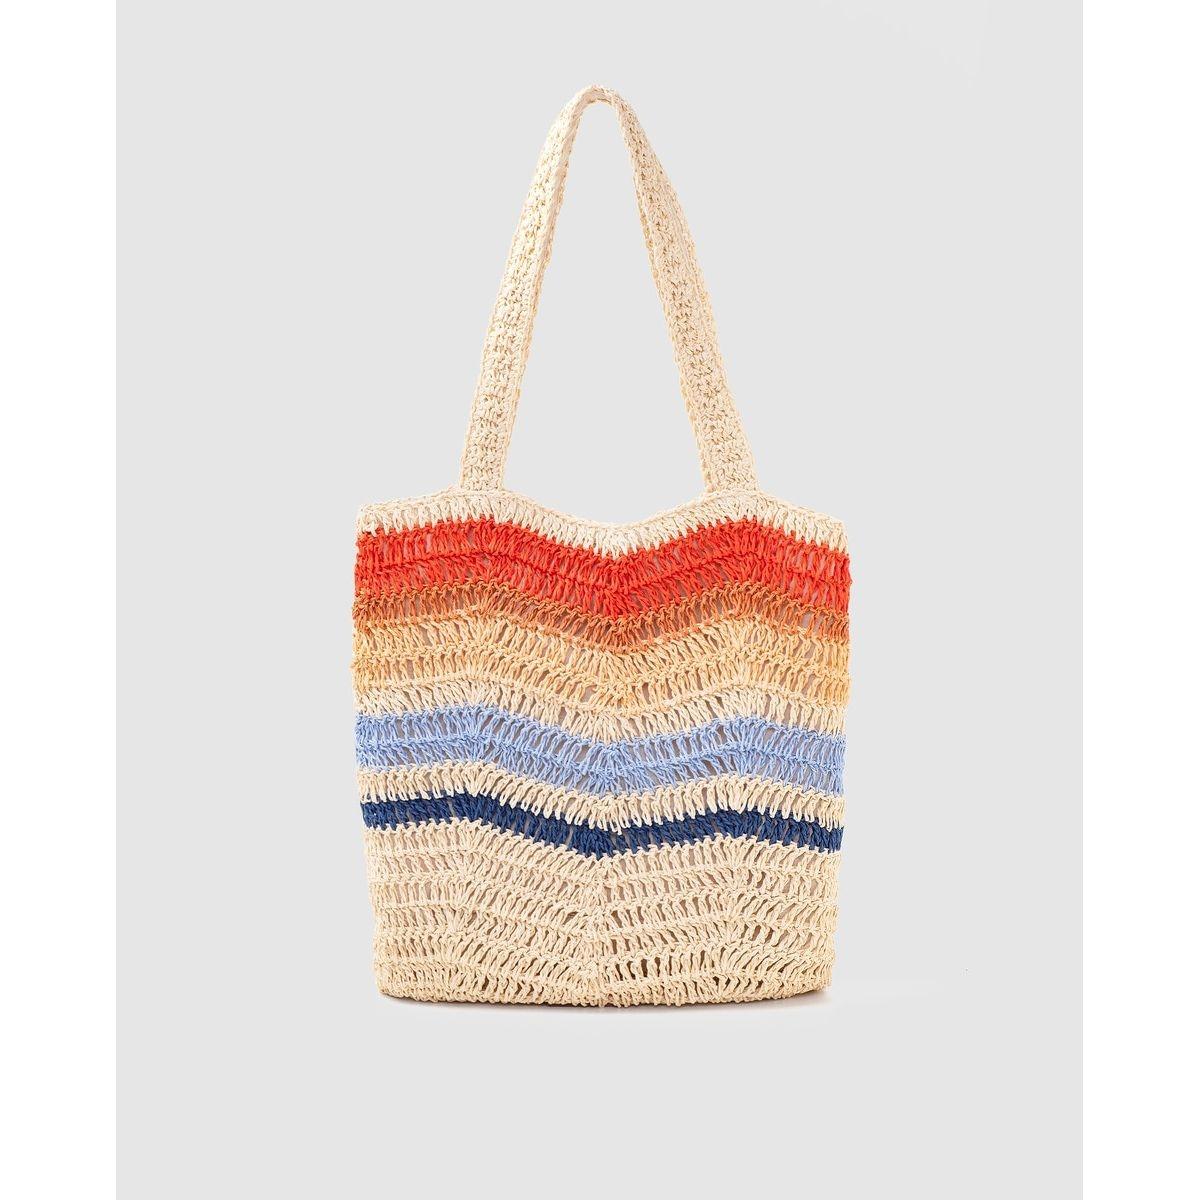 Grand sac cabas de plage à motif